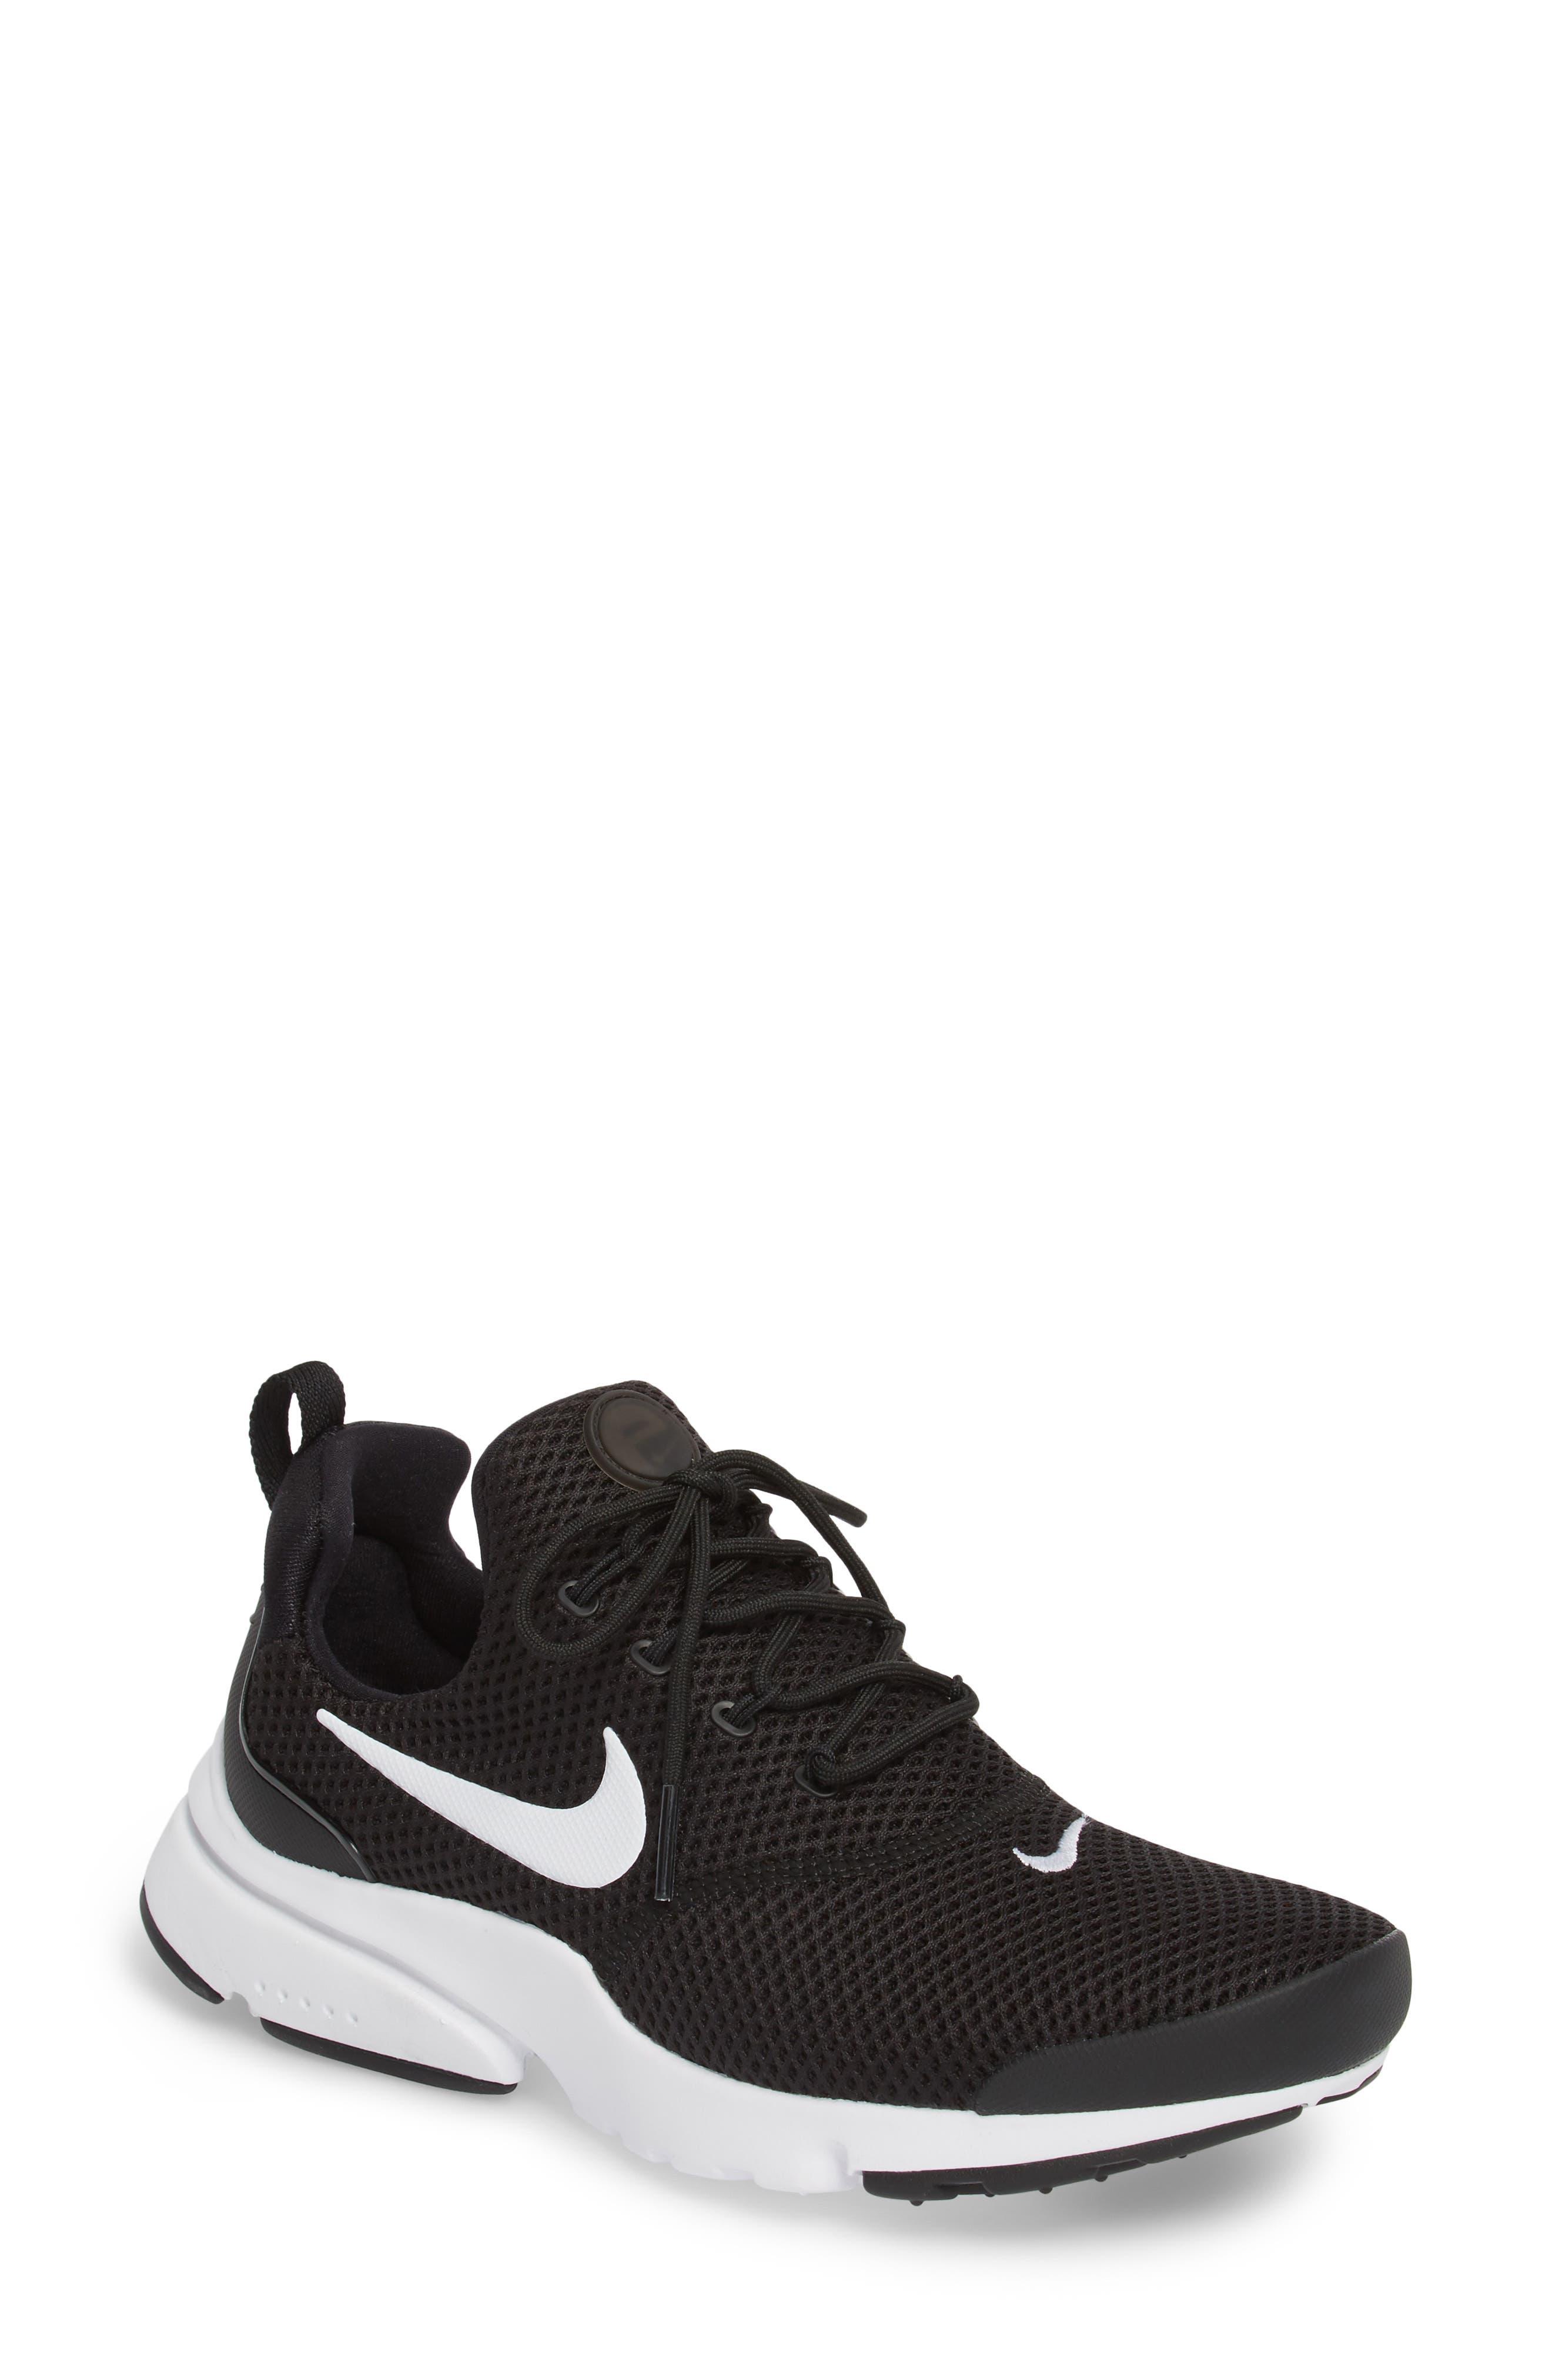 Presto Fly Sneaker,                         Main,                         color, Black/ White/ White